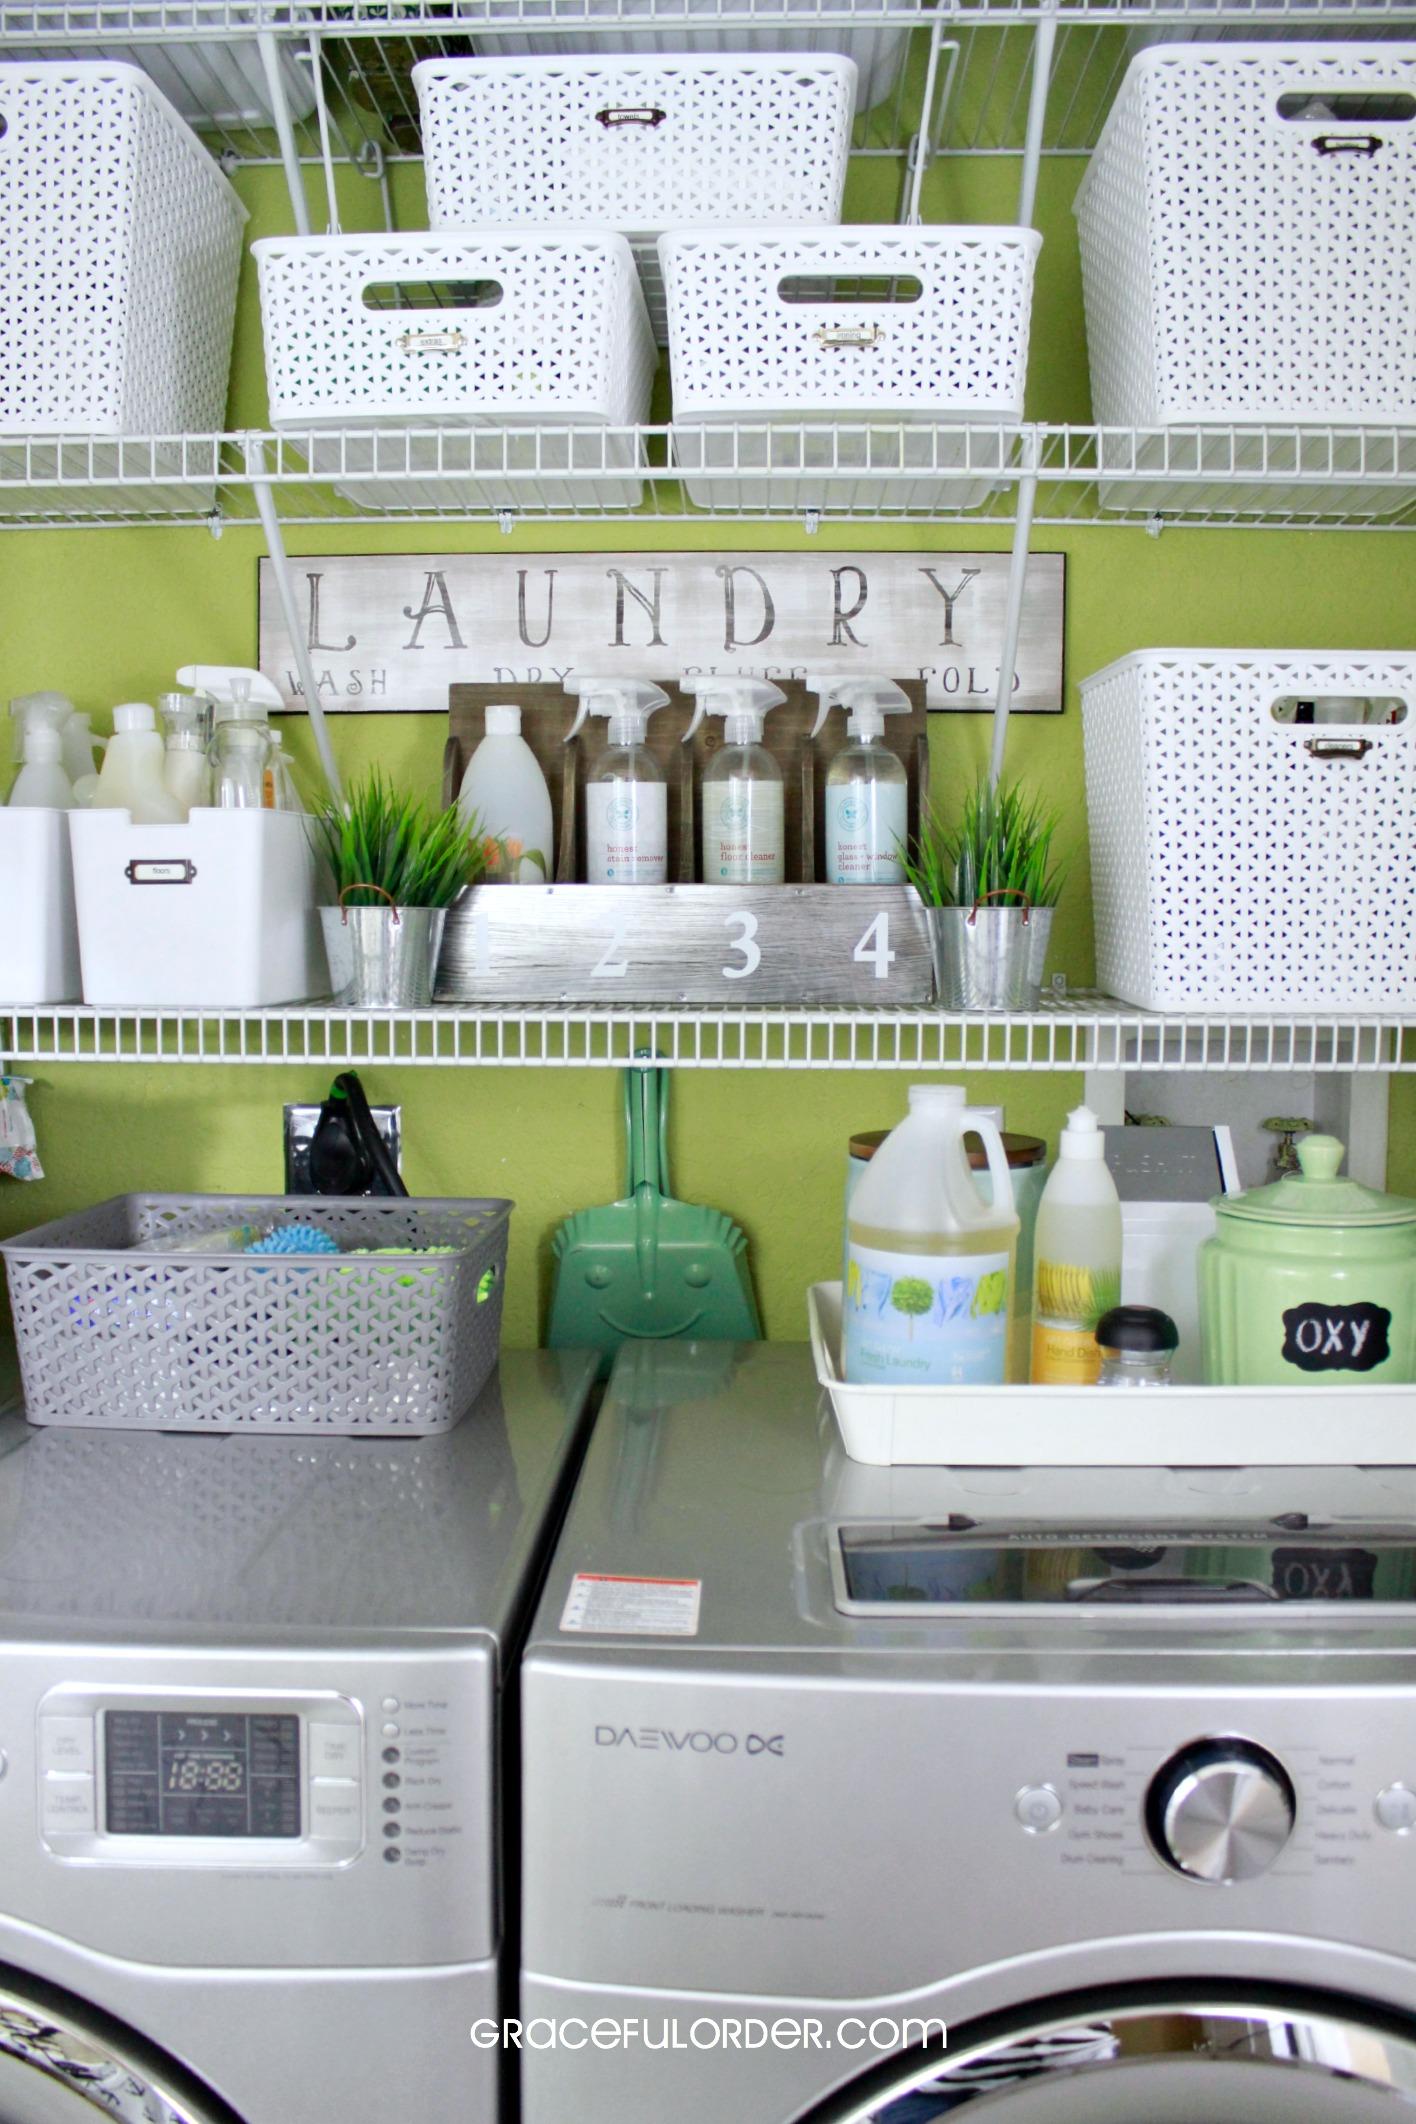 Laundry Room Organization Ideas Graceful Order